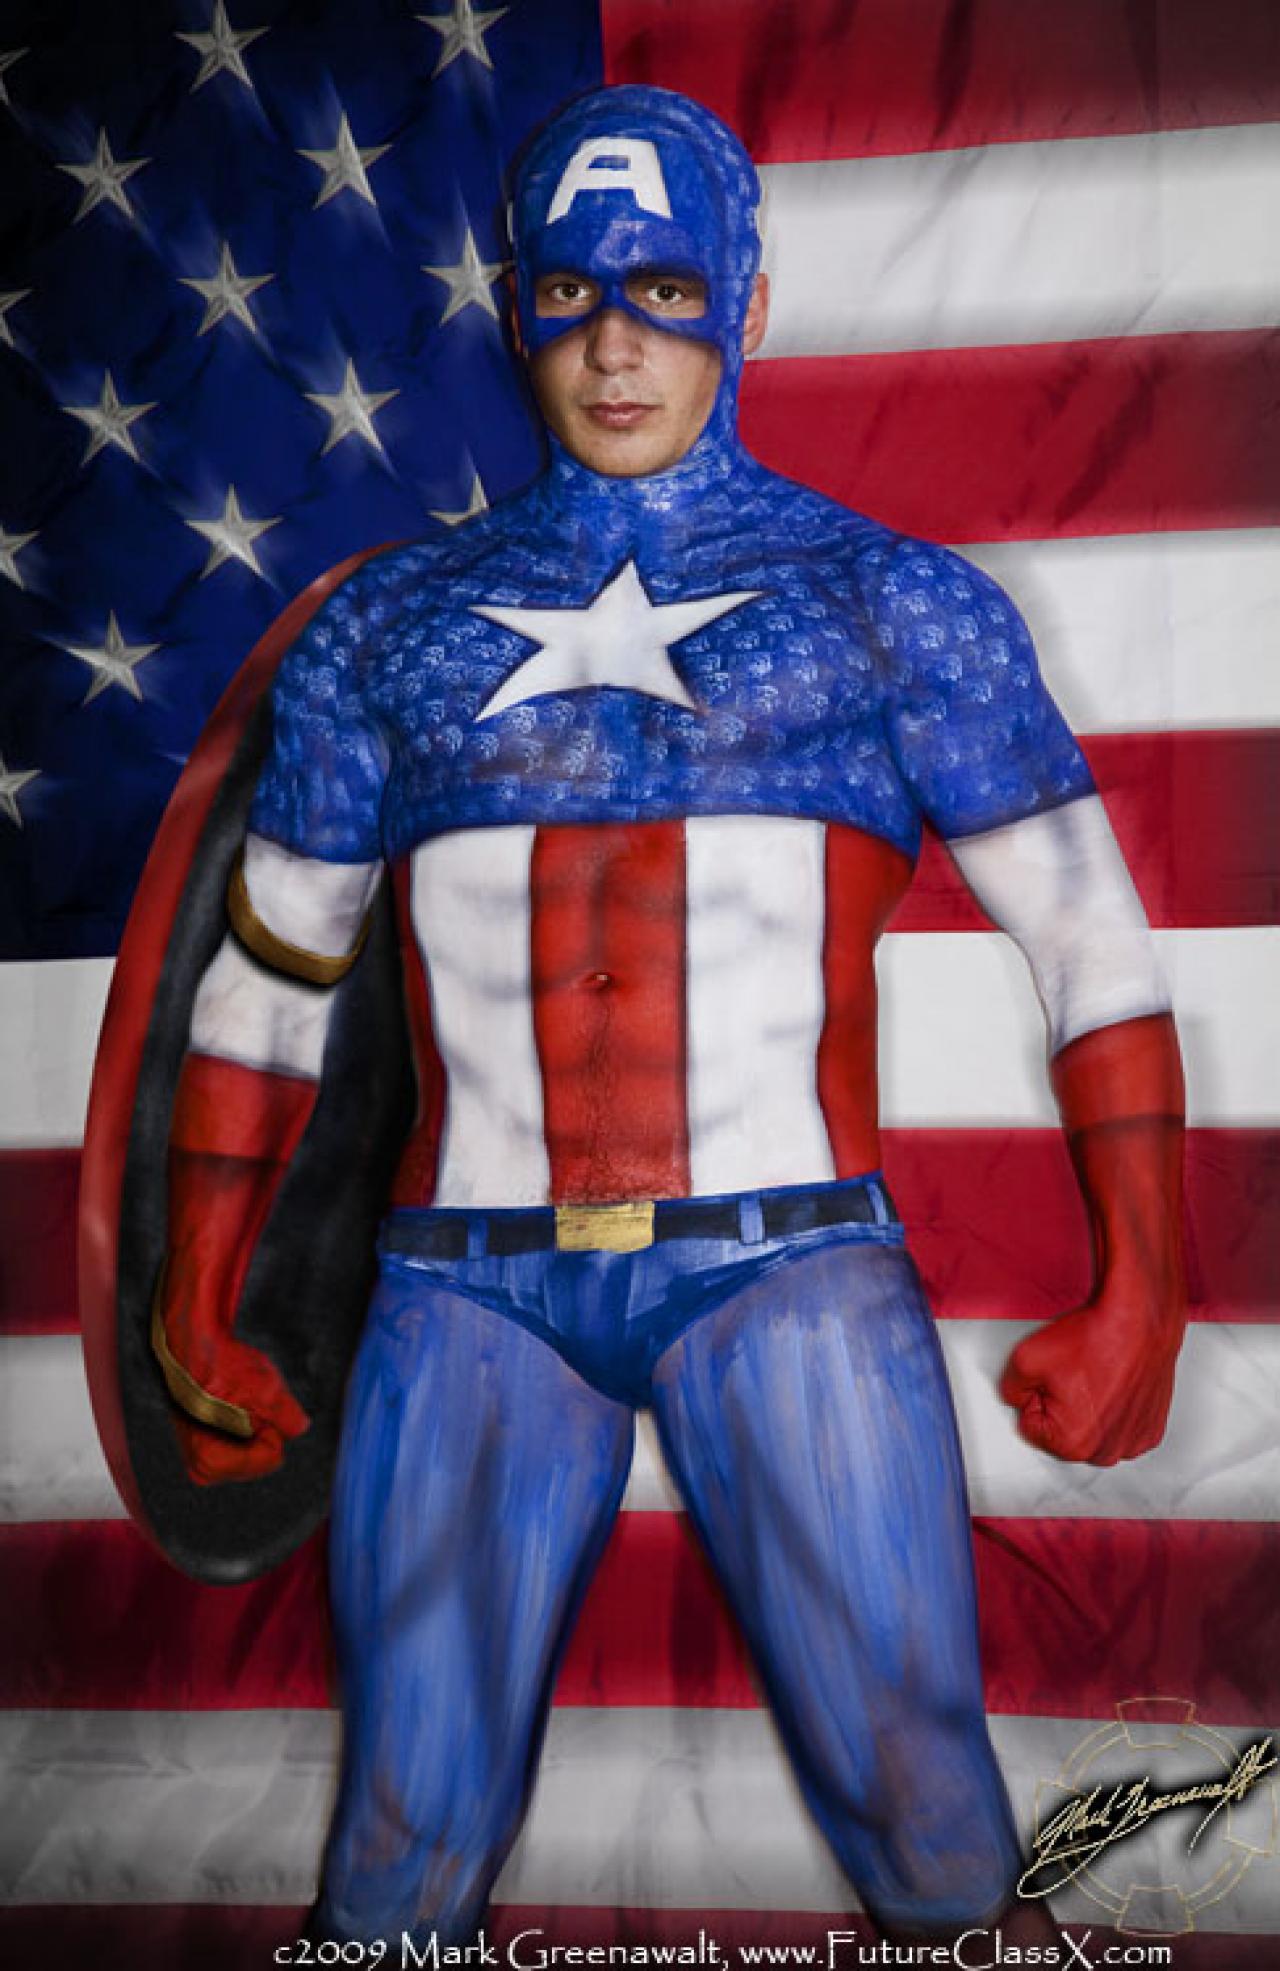 17 amazing bodypaint superhero costumes definitely nsfw for America s finest paint